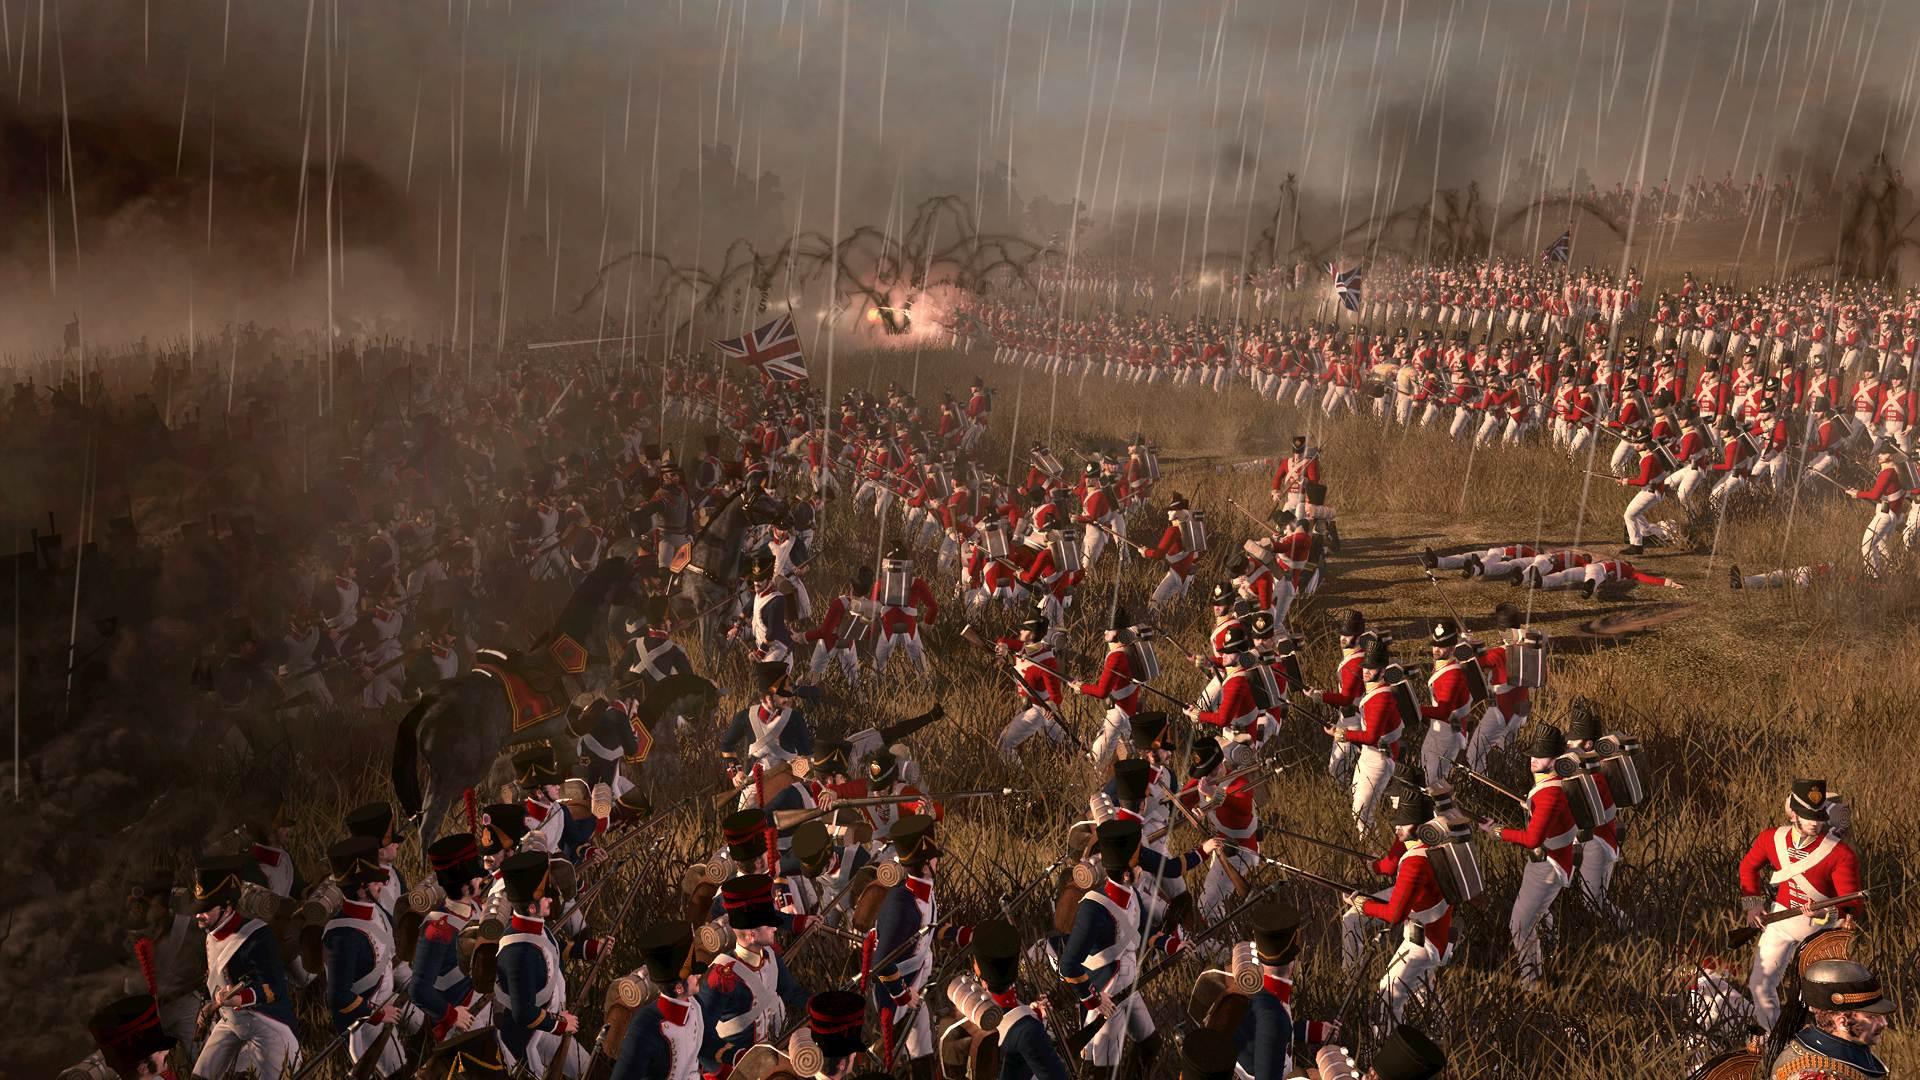 Image Napolon Total War   GameNews 1920x1080